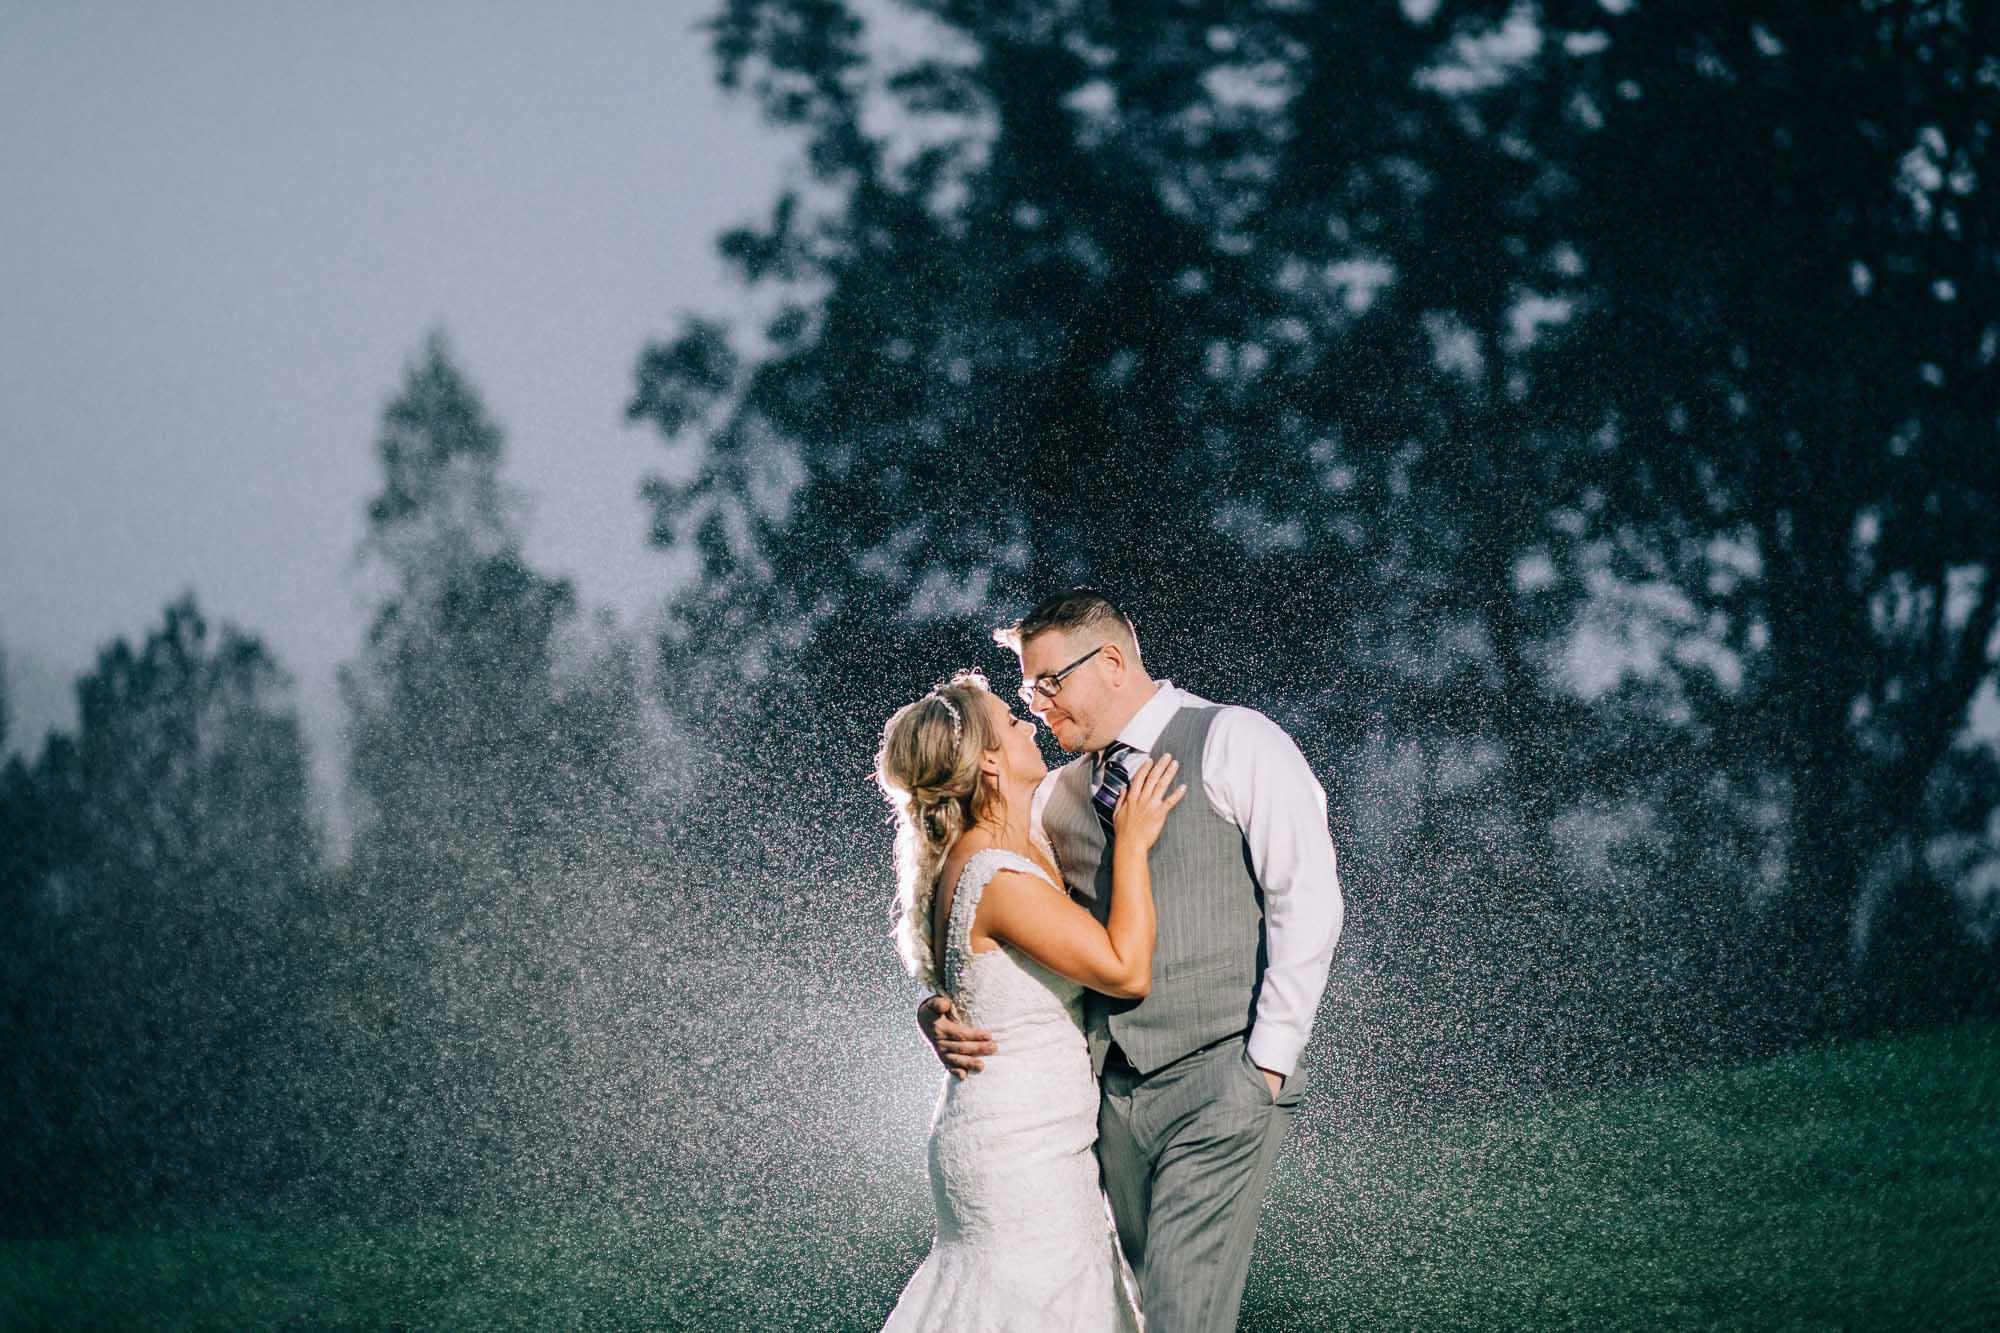 Lodge-at-Raven-Creek-October-wedding-76.jpg